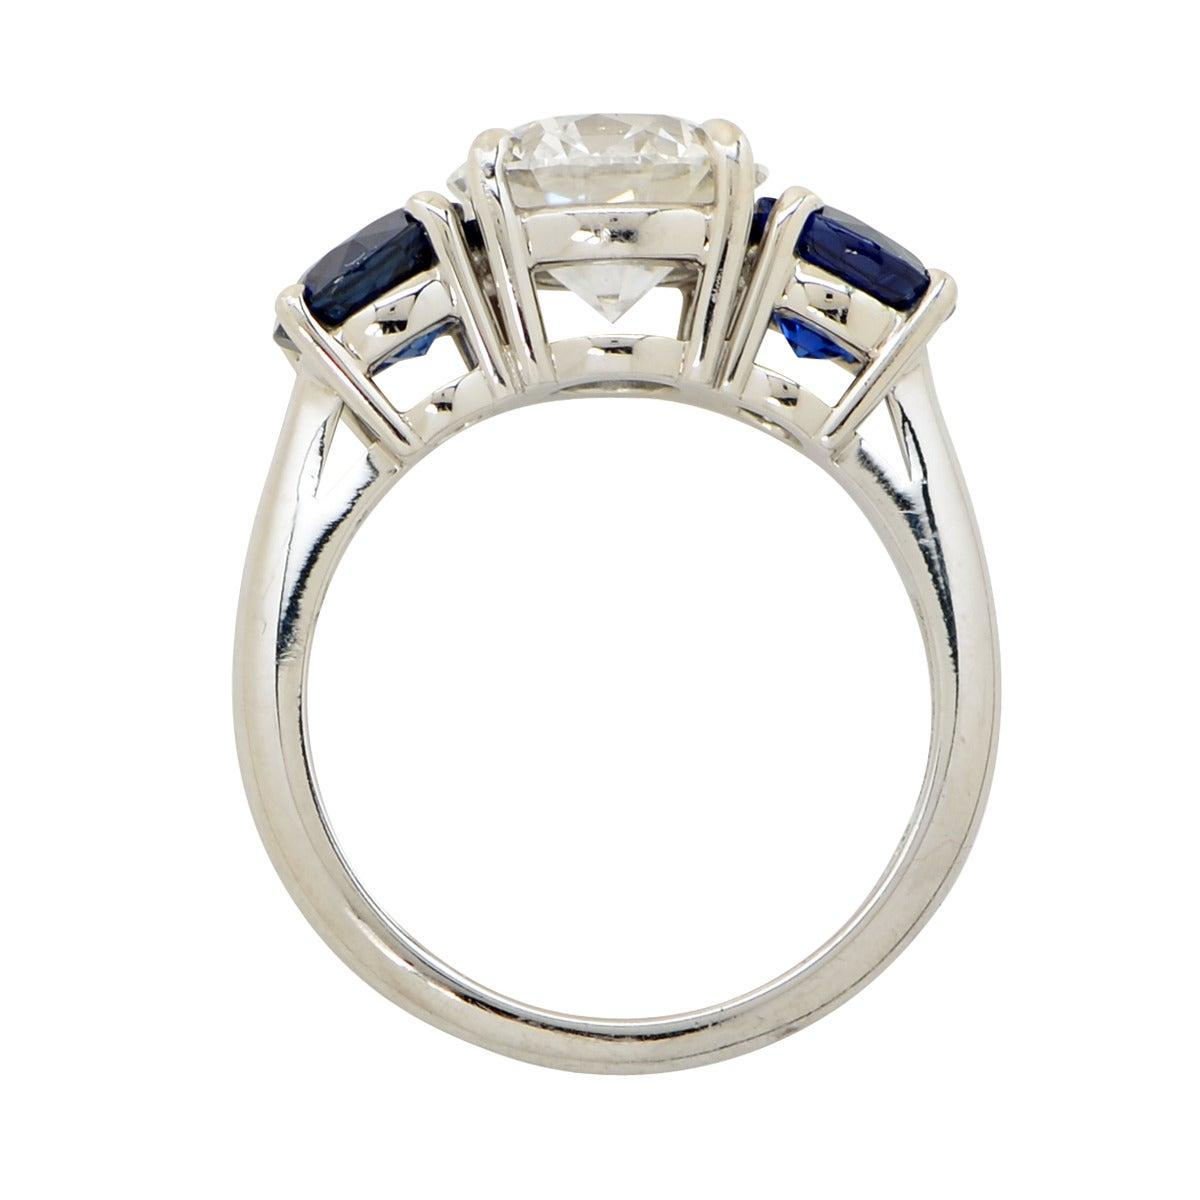 2 35 Carat E VS1 GIA Tiffany and Co Sapphire Diamond Platinum Ring at 1stdibs